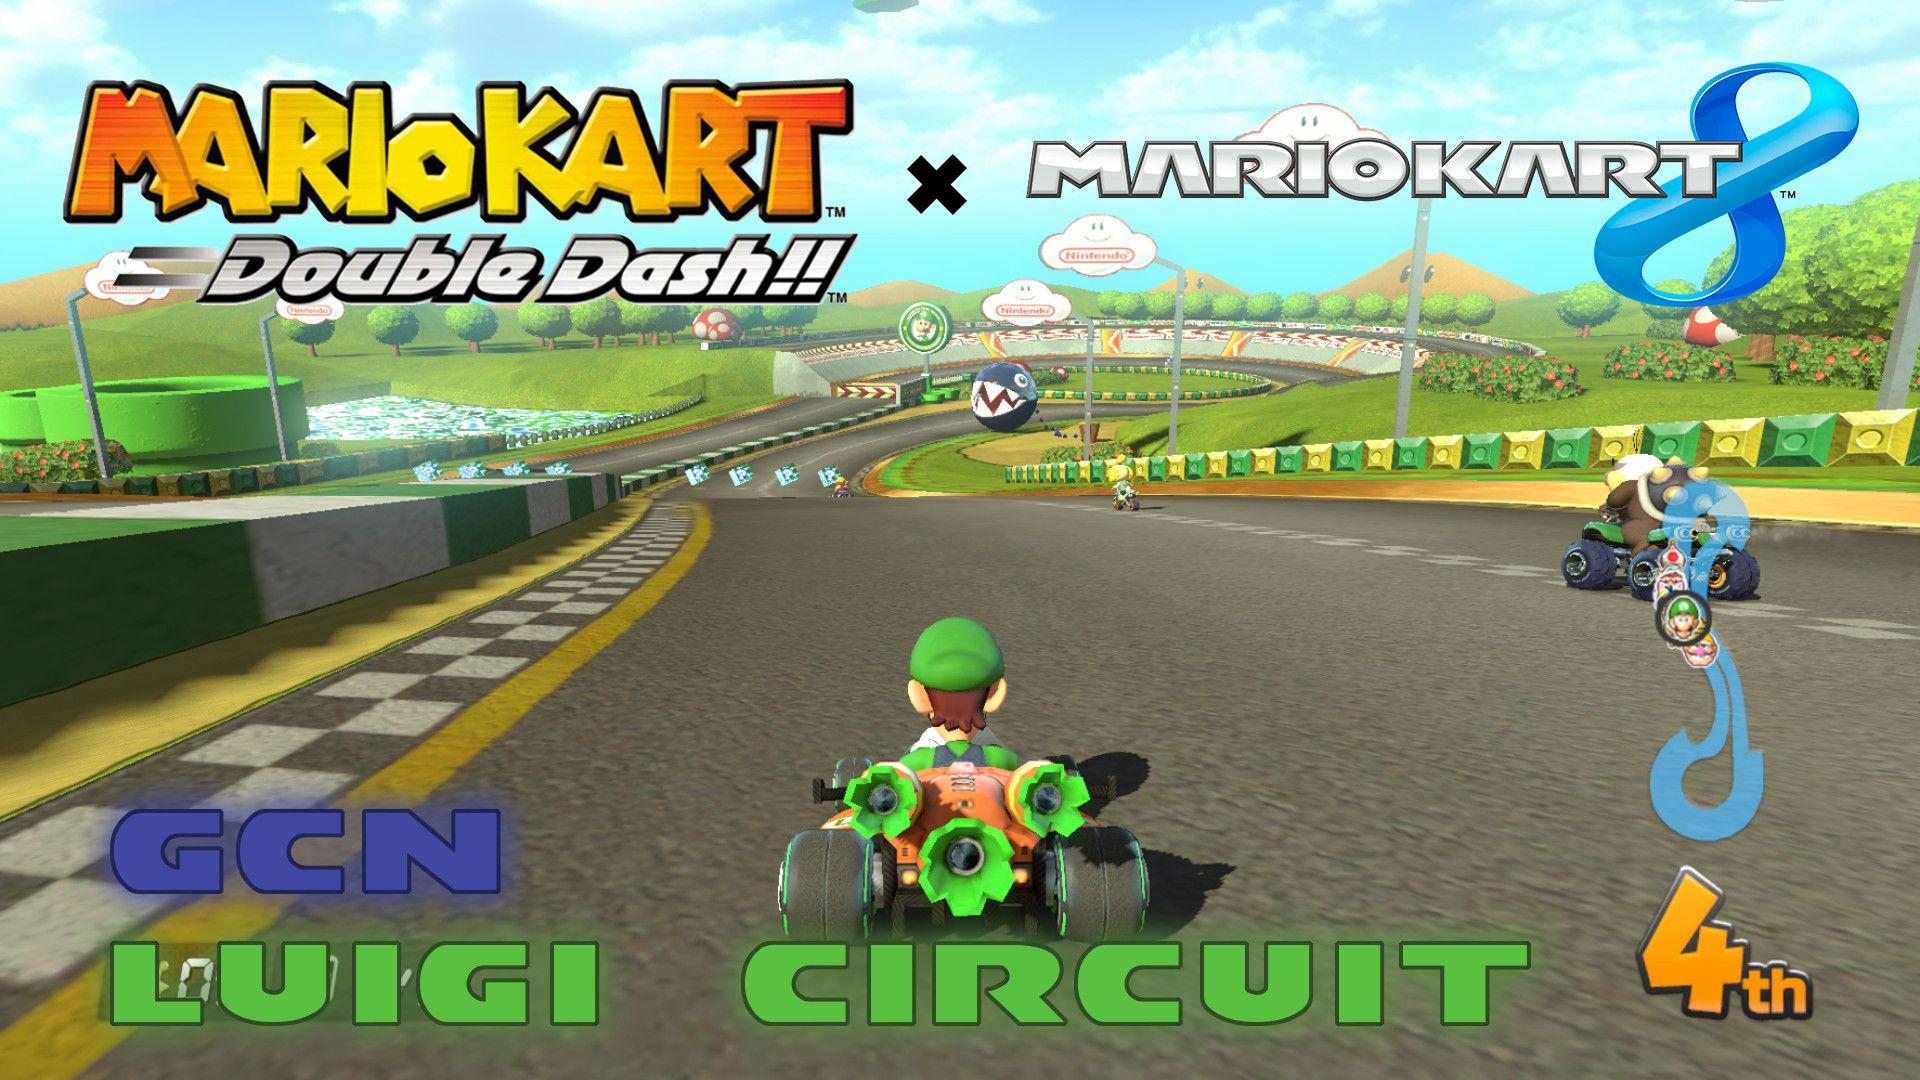 Mario Kart Double Dash Wallpapers Wallpaper Cave